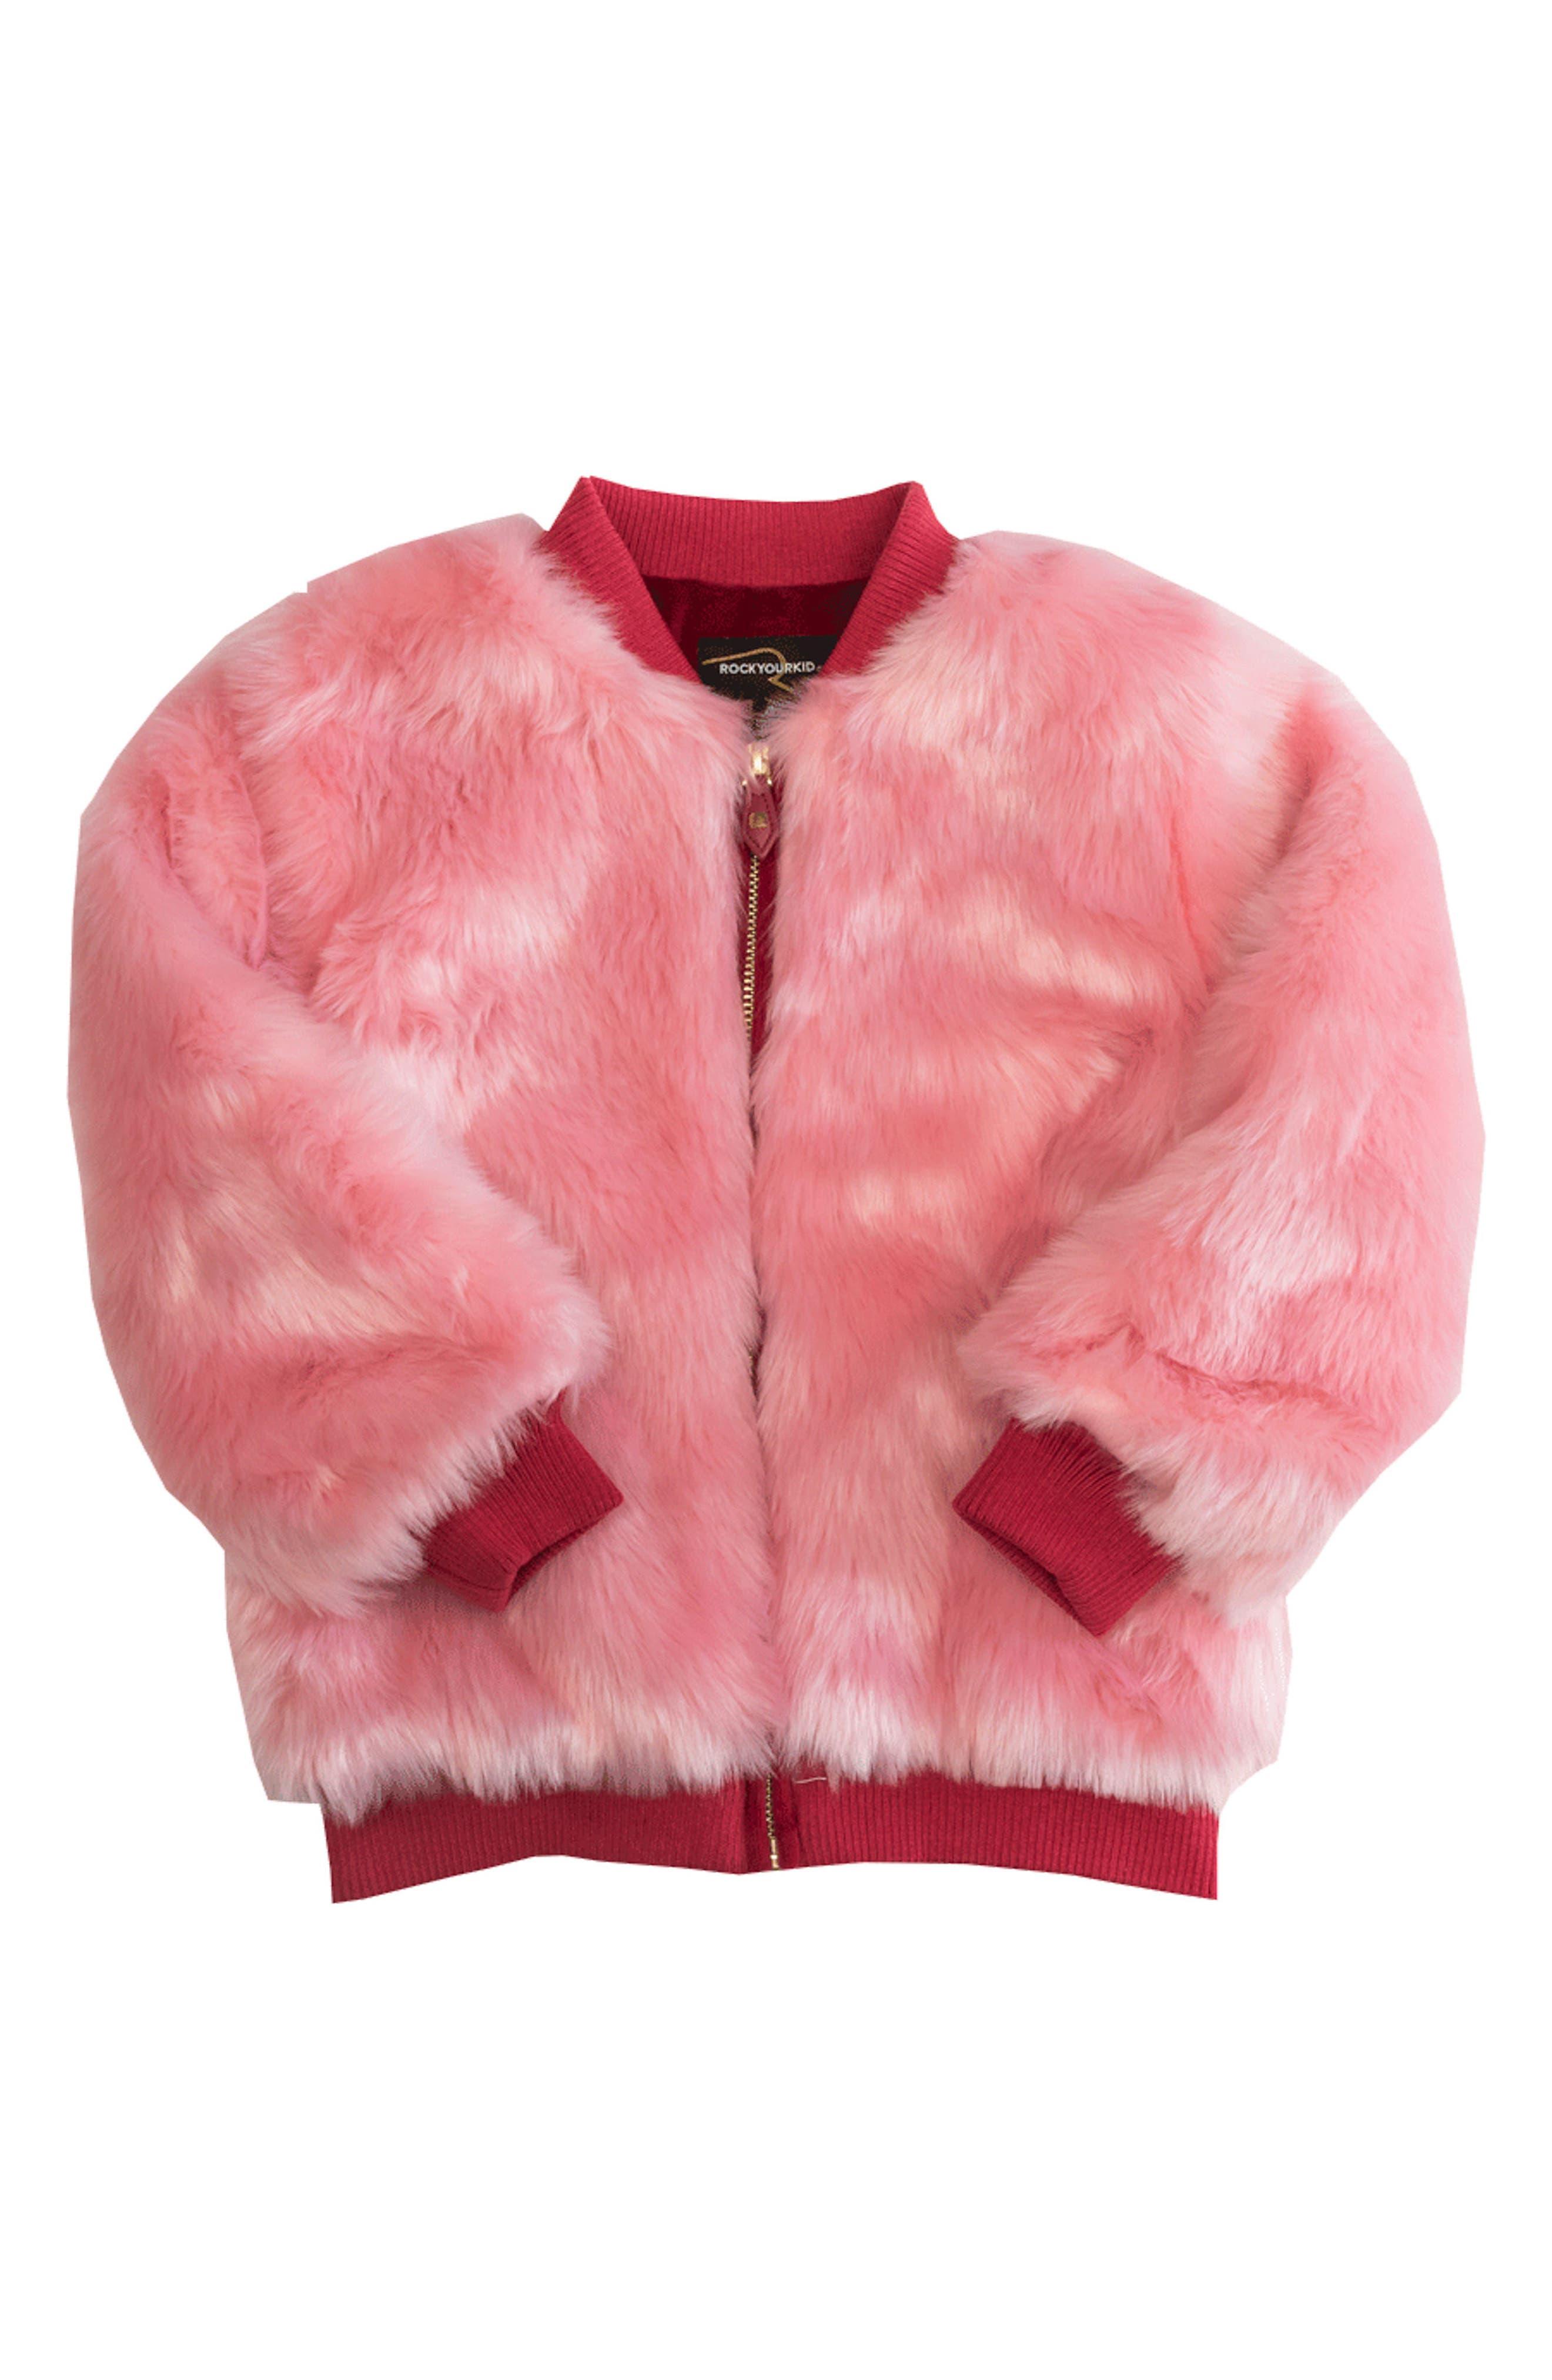 Main Image - Rock Your Kid Debbie Faux Fur Bomber Jacket (Toddler Girls & Little Girls)